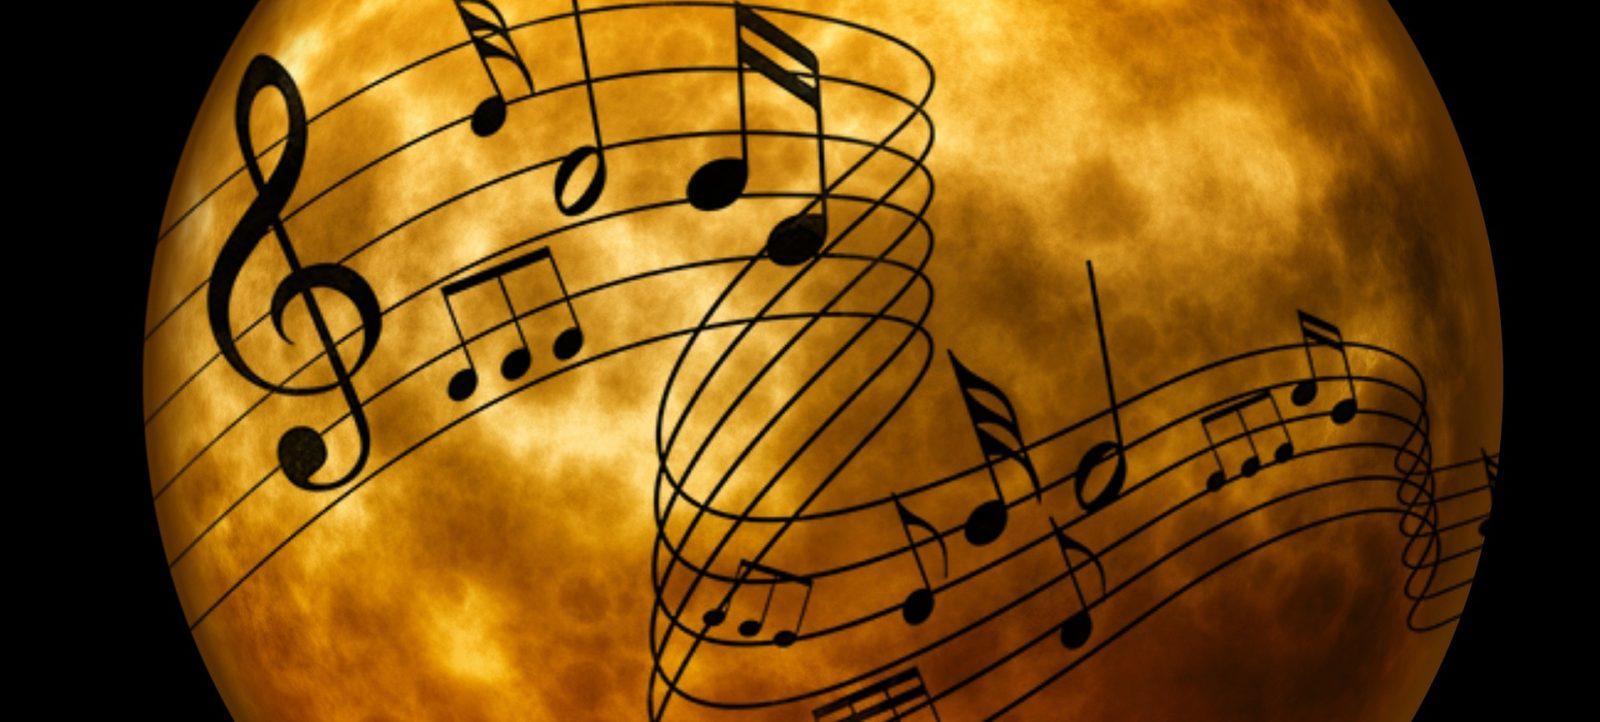 Úton a zene – Csorna